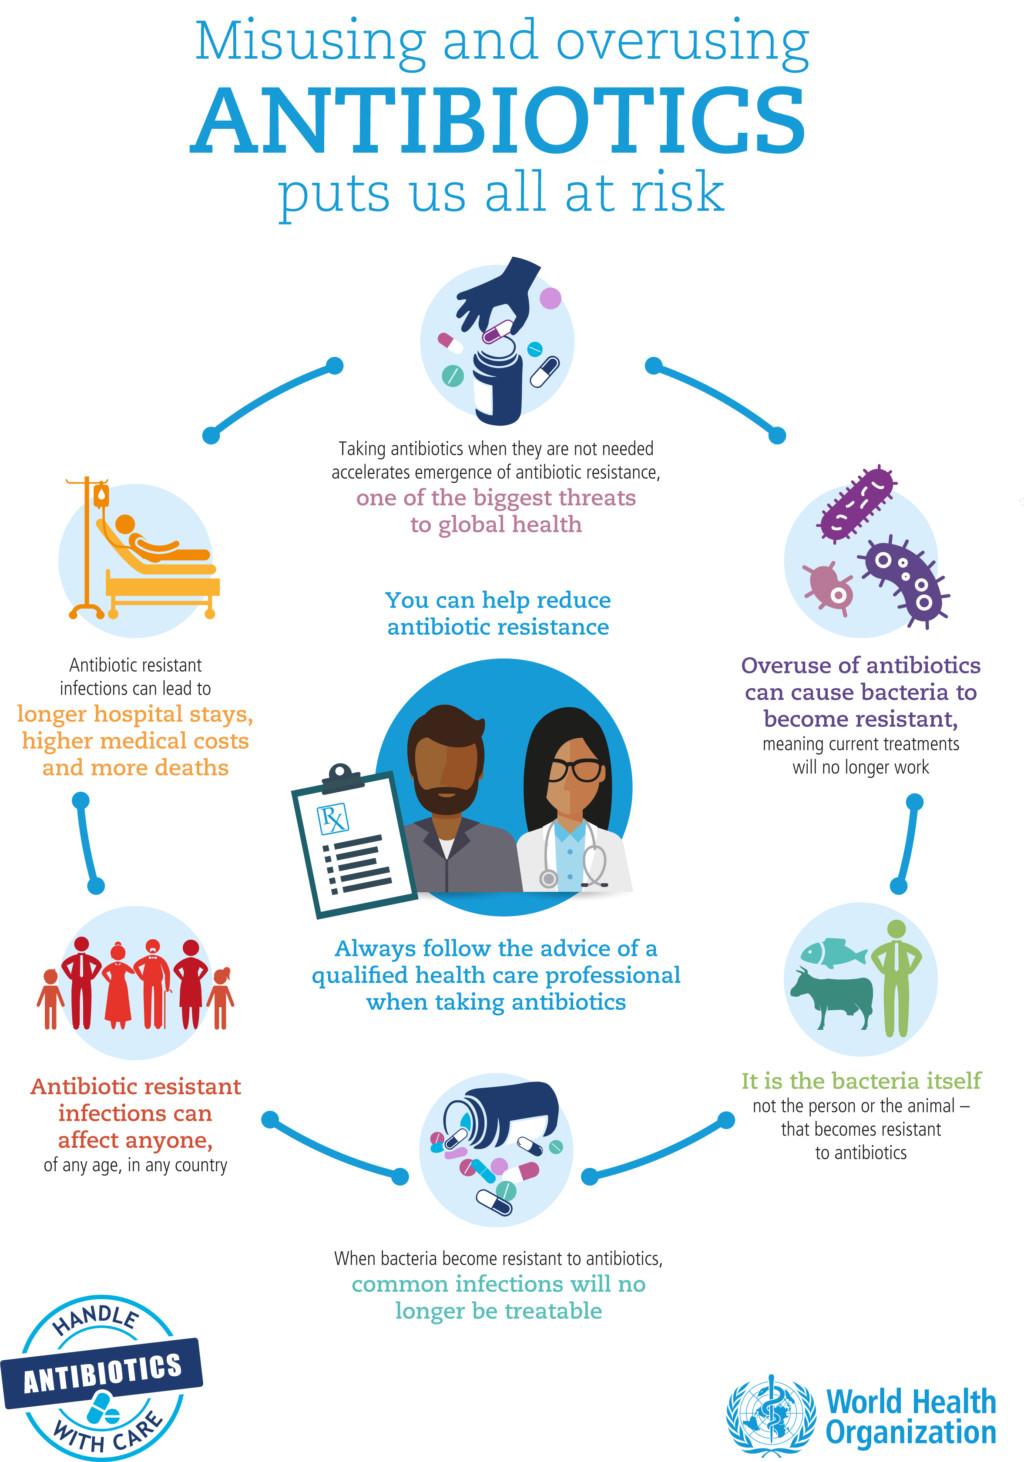 antibiotics misuse overuse Infographic